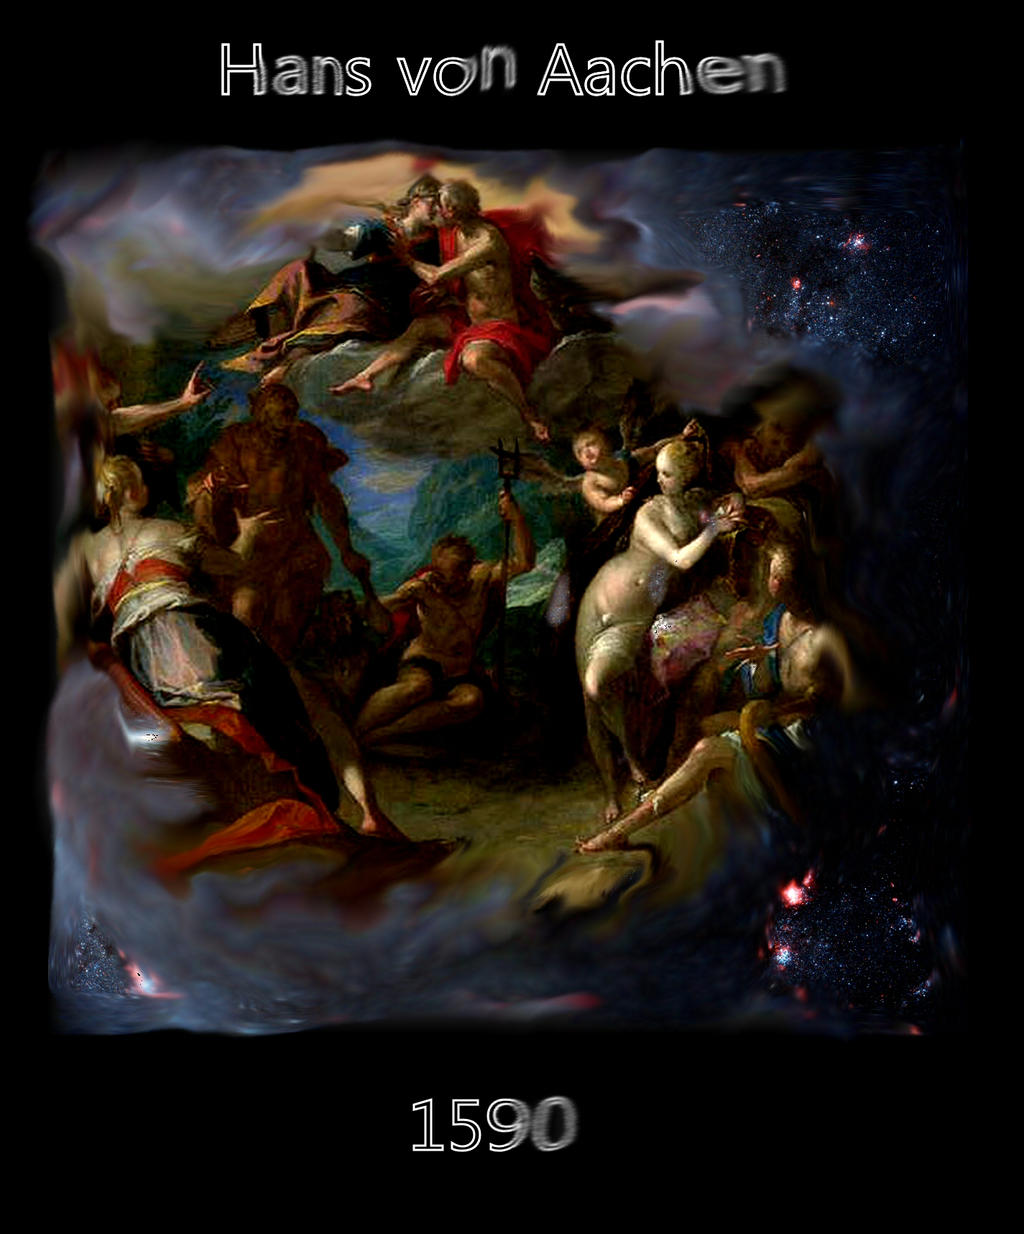 HUBBLE PROJECT Hans von Aachen by ChristopherMBove on DeviantArt